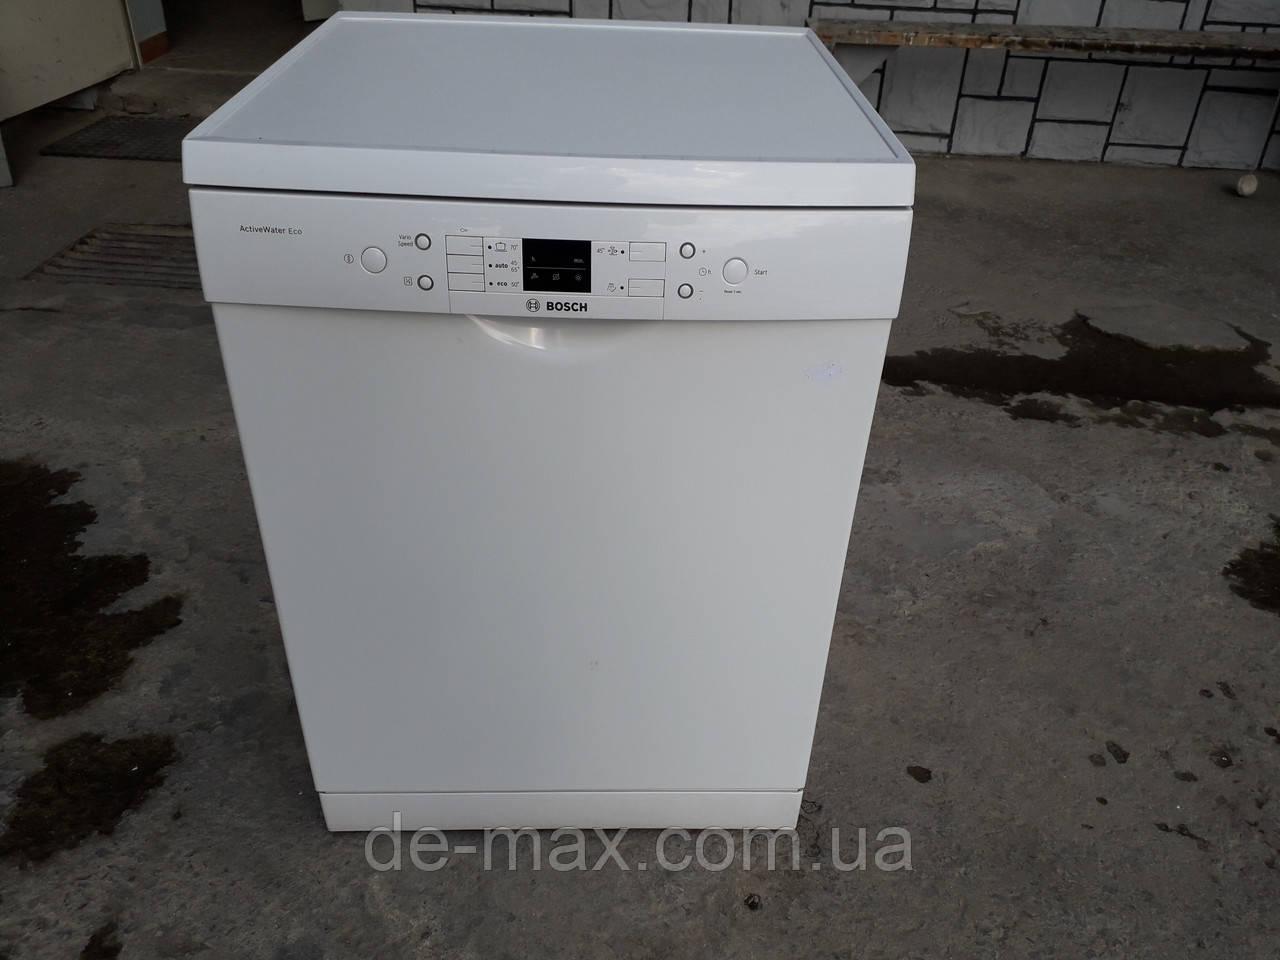 moins cher 2aac1 addab Посудомоечная машина Bosch SMS58M32EU 60см А++ VarioSpeed / AquaSensor